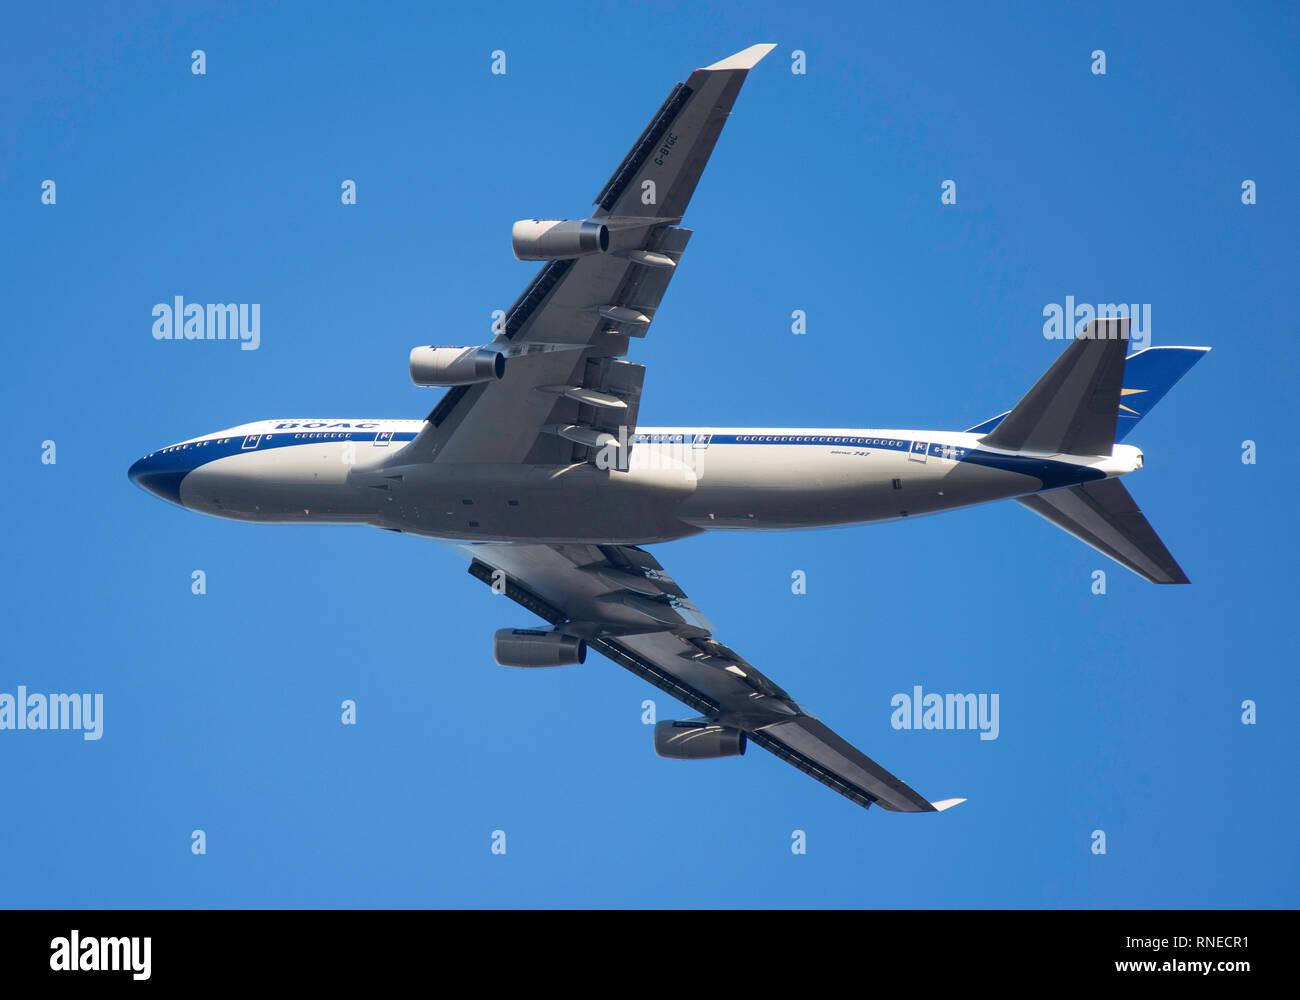 747 Historic Stock Photos & 747 Historic Stock Images - Alamy